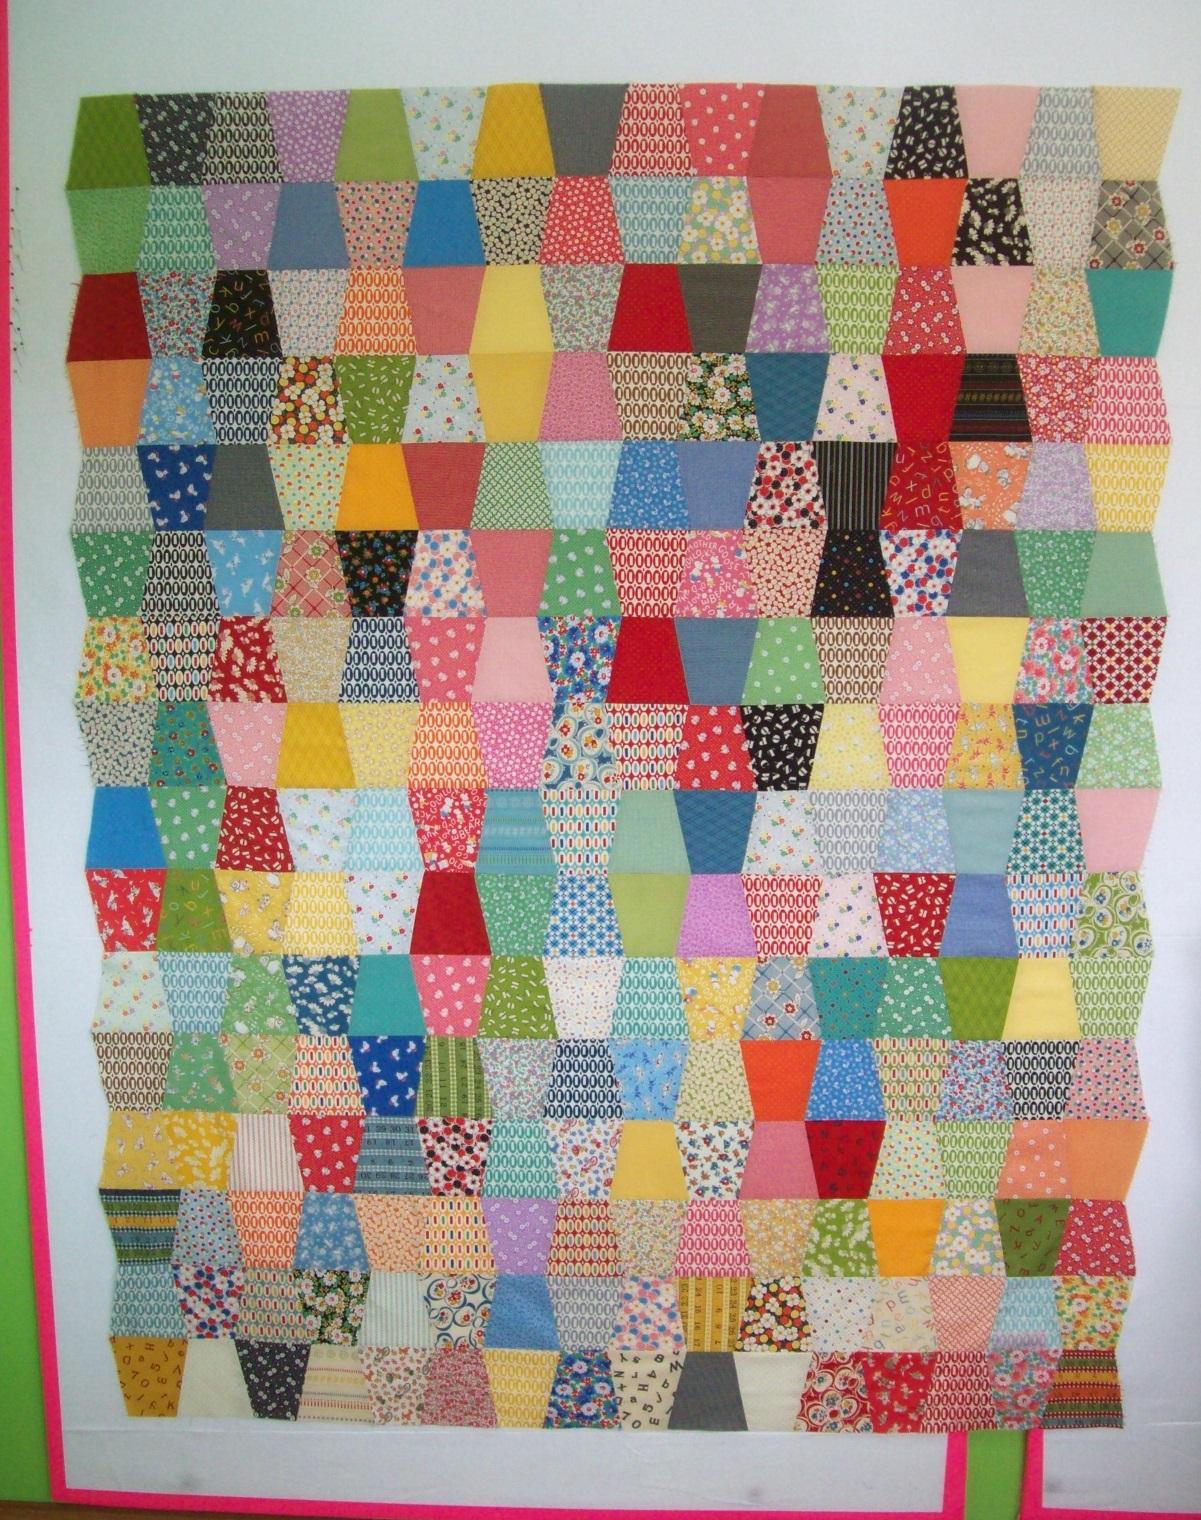 Name:  Vintage ReproductionTumbler quilt 4-2013 sm.JPG Views: 1870 Size:  871.3 KB